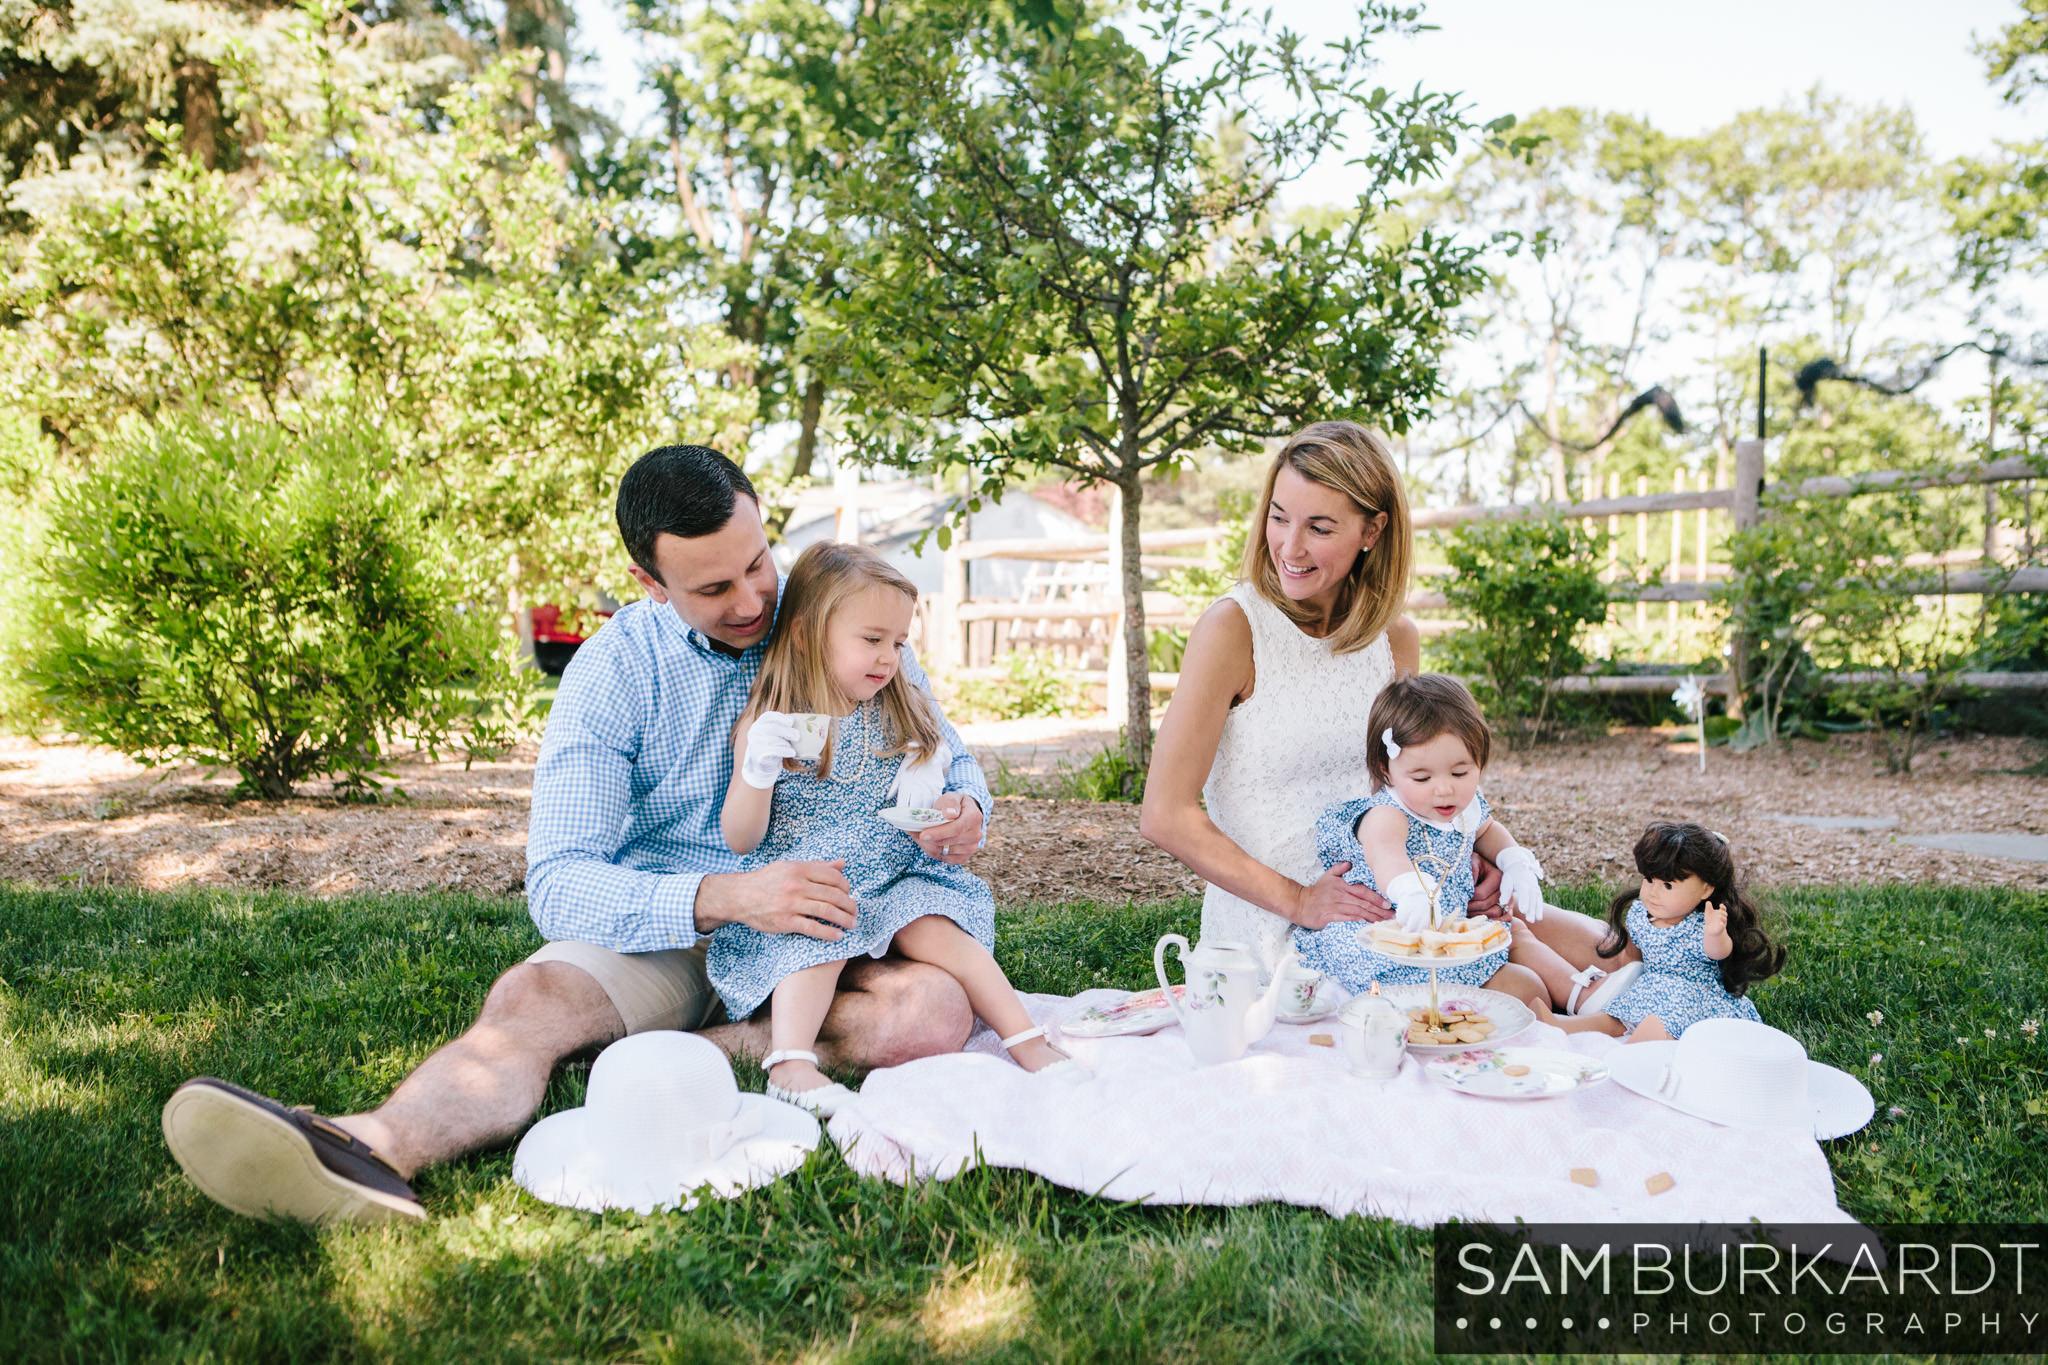 sburkardt_family_portraits_photoshoot_ridgefield_connecticut_summer_tea_party_014.jpg